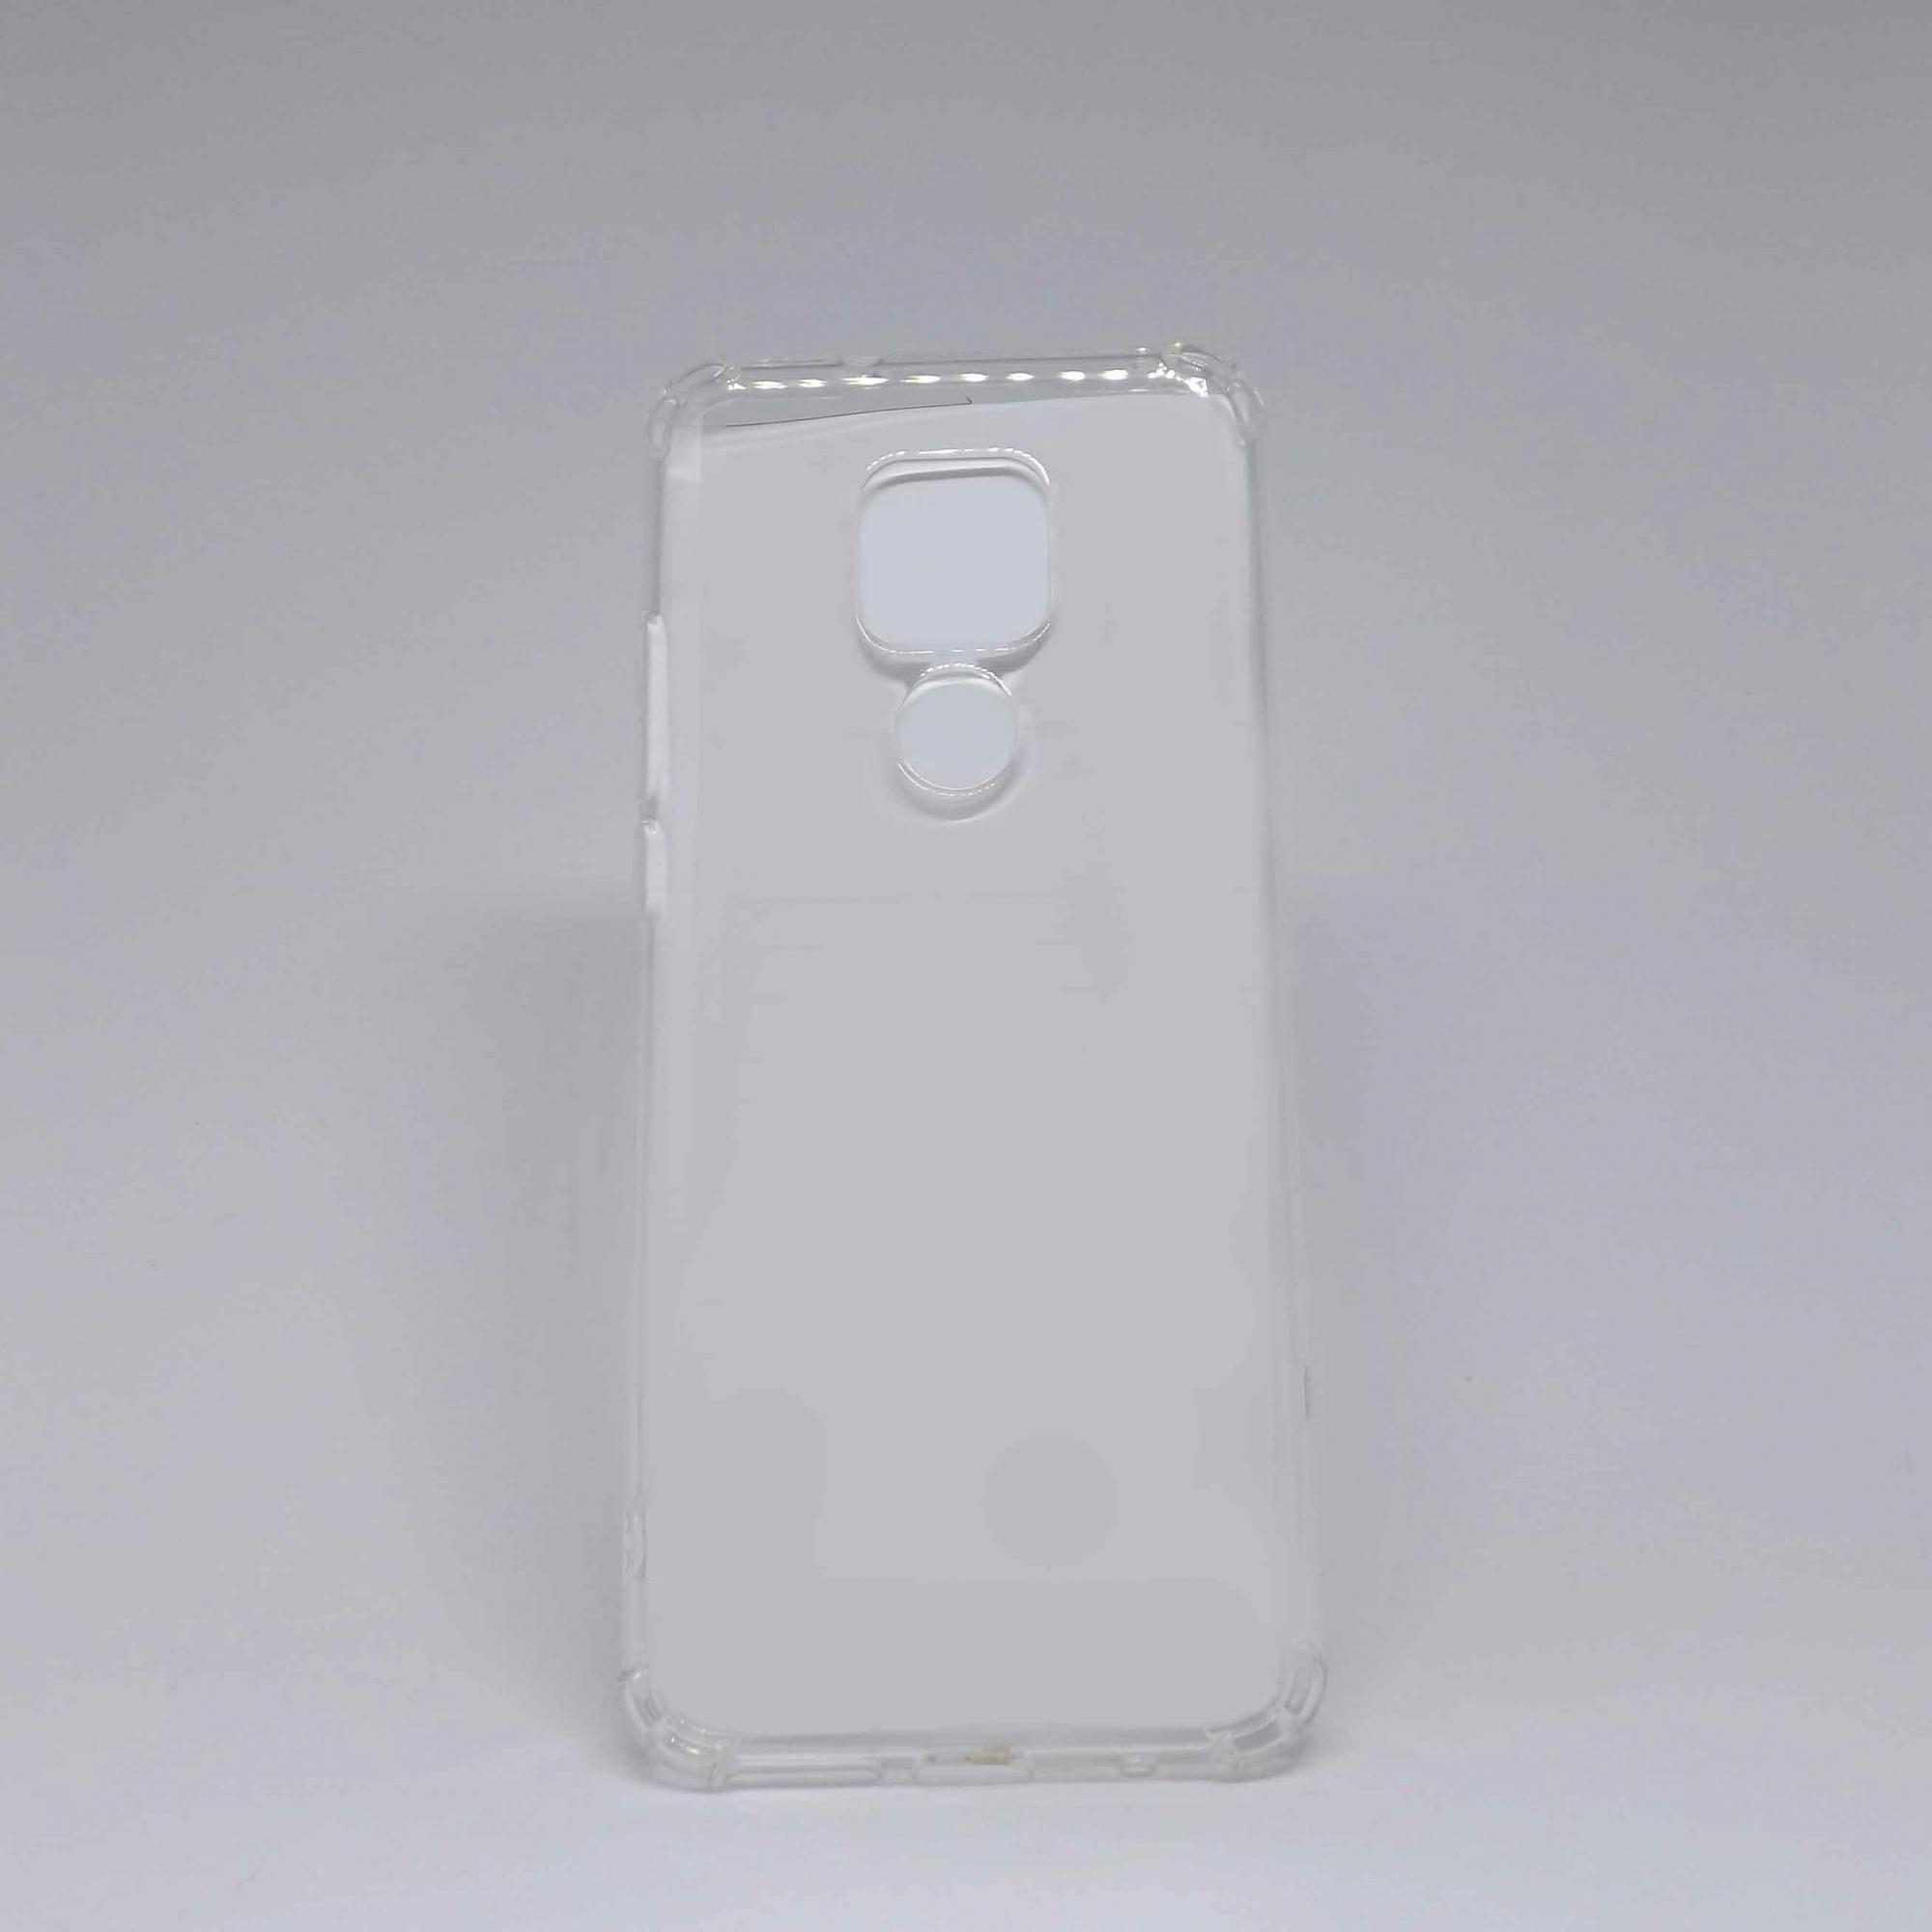 Capa Motorola G Play Transparente